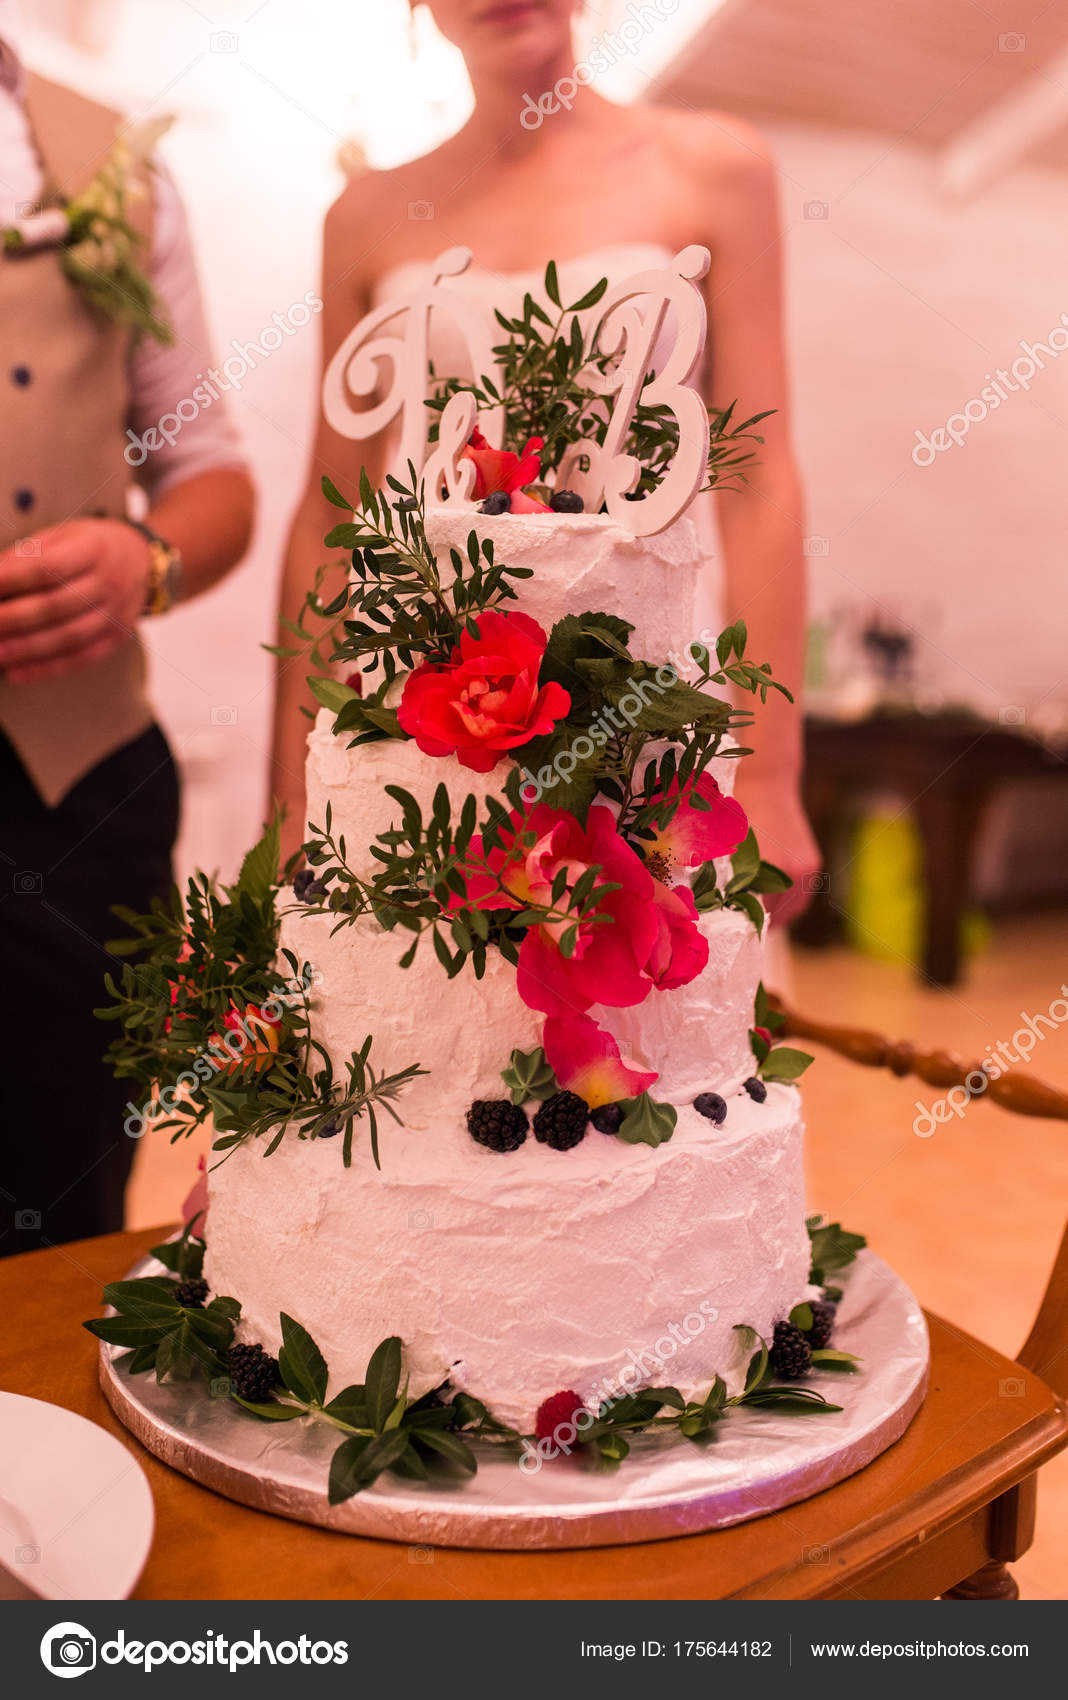 Beautiful Four Tiered White Wedding Cake Pink Flowers Greenery